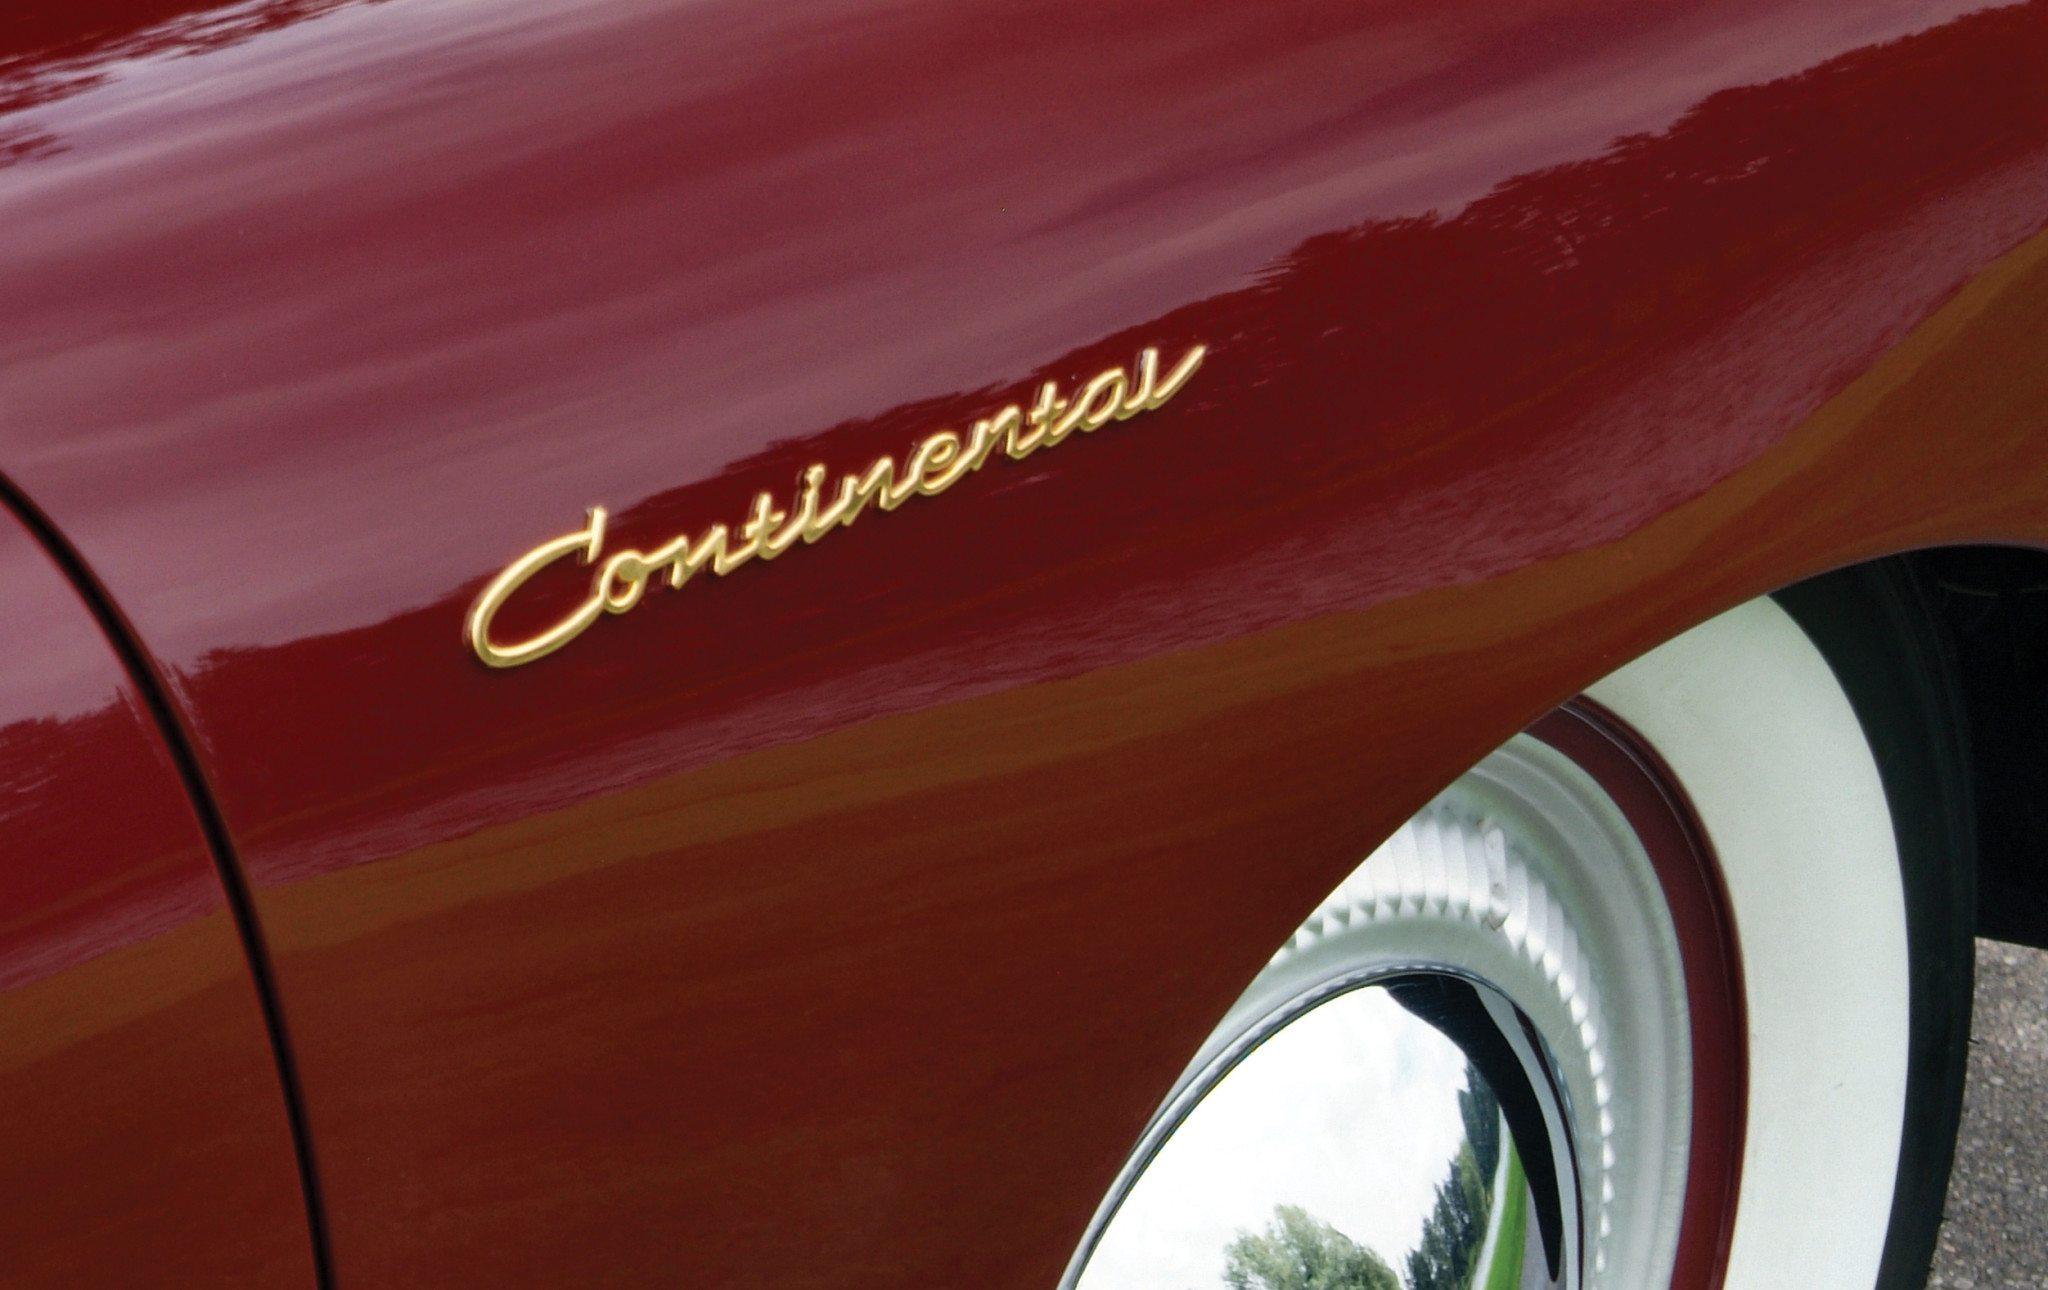 356 Continental Cabriolet Reutter Coachwork